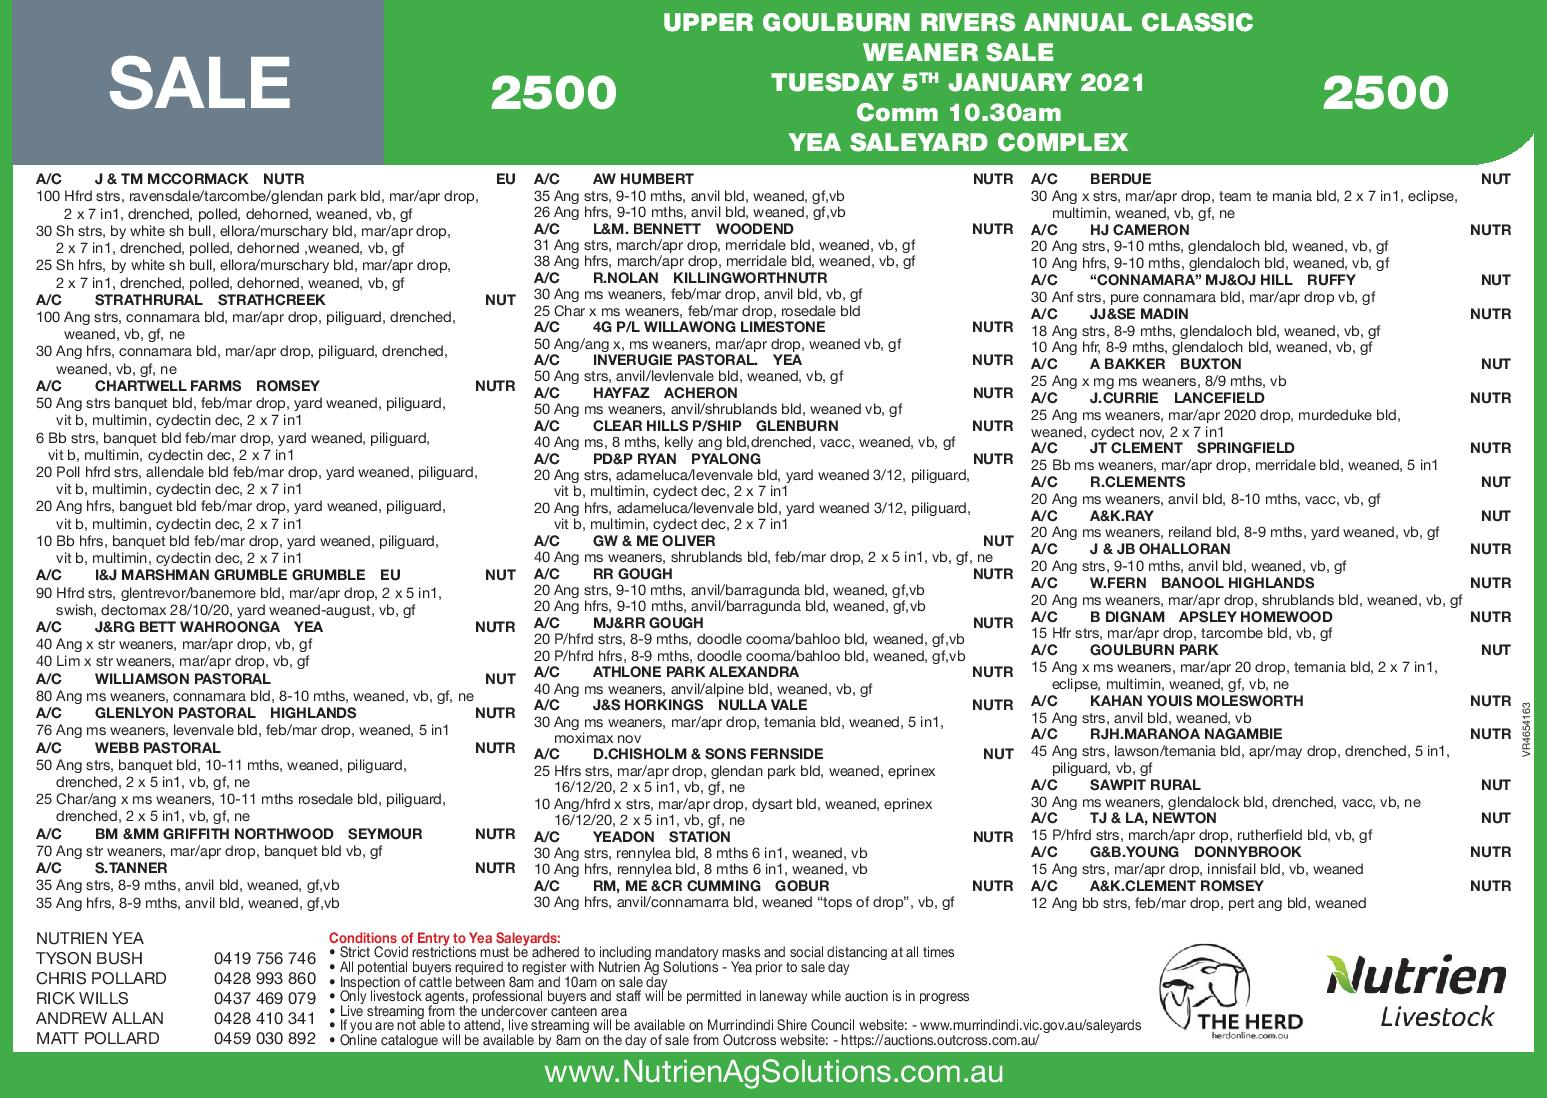 UPPER GOULBURN RIVERS ANNUAL CLASSIC WEANER SALE2500